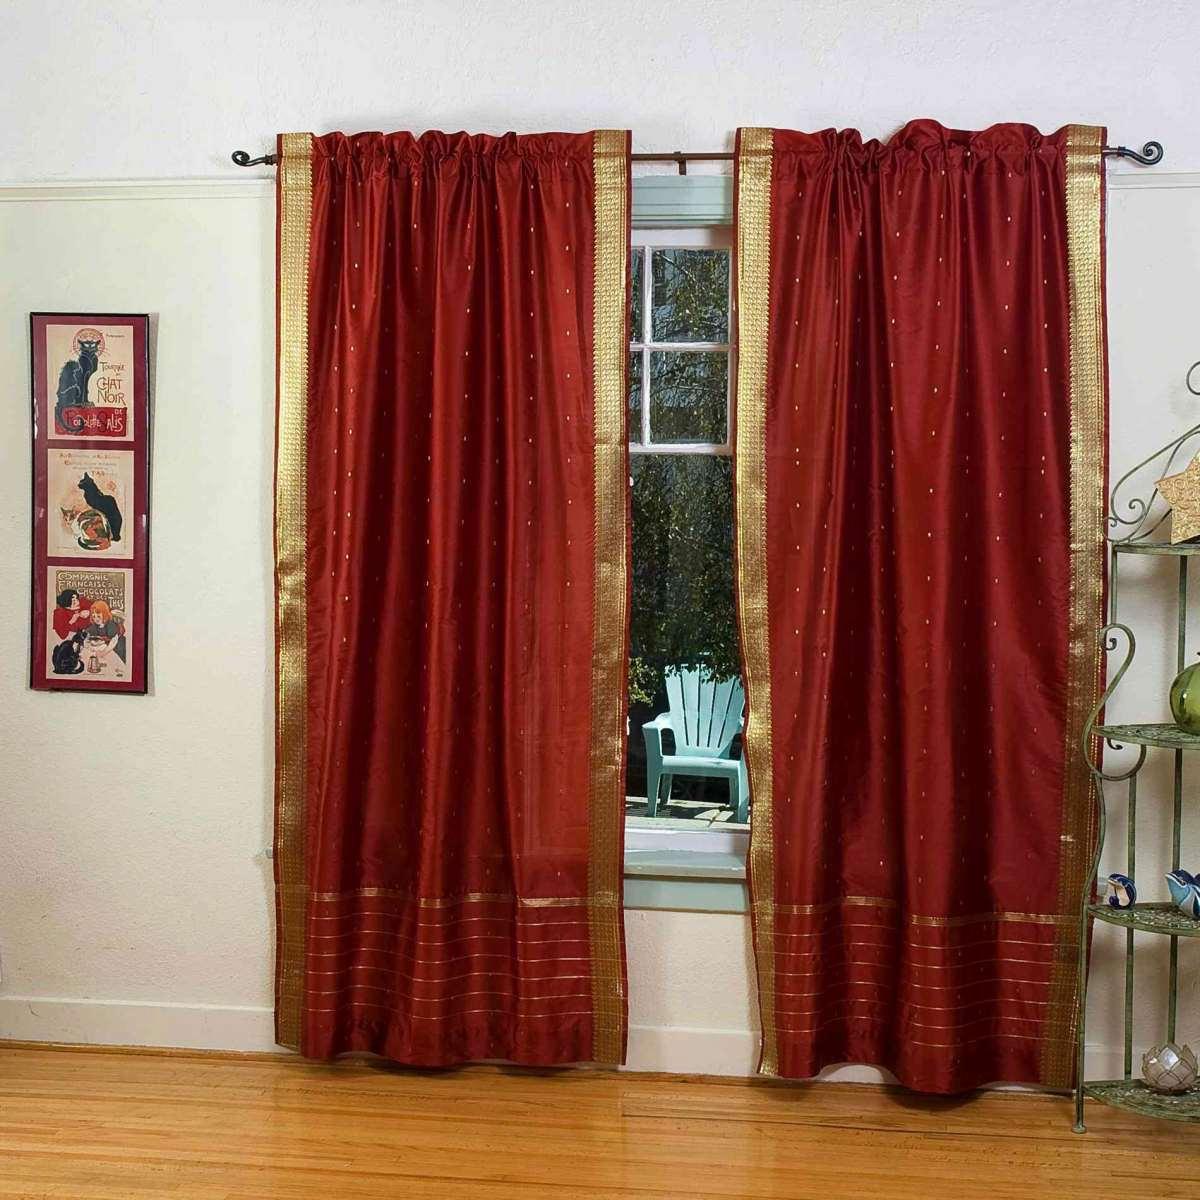 Lined-Rust Rod Pocket  Sheer Sari Cafe Curtain  Drape - 43W x 24L - Piece